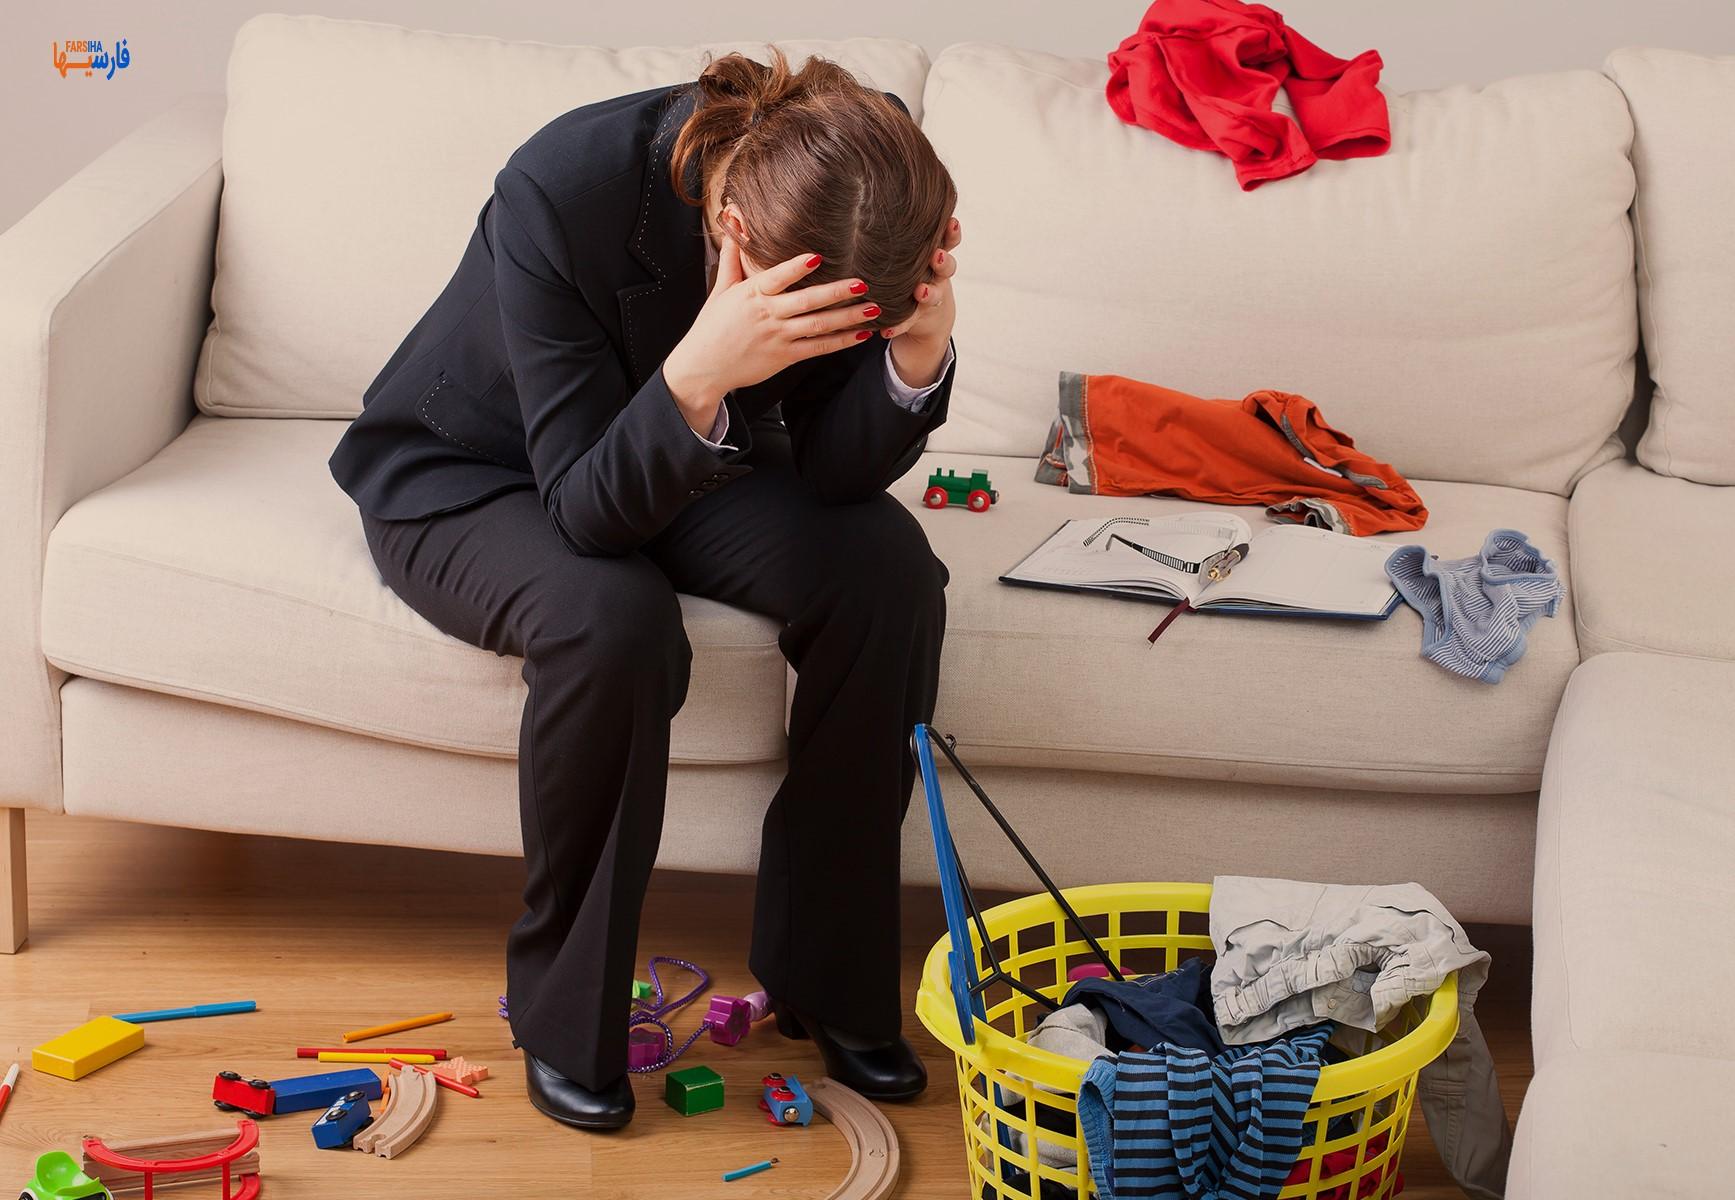 تاثیر شلوغی بر سلامتی روان